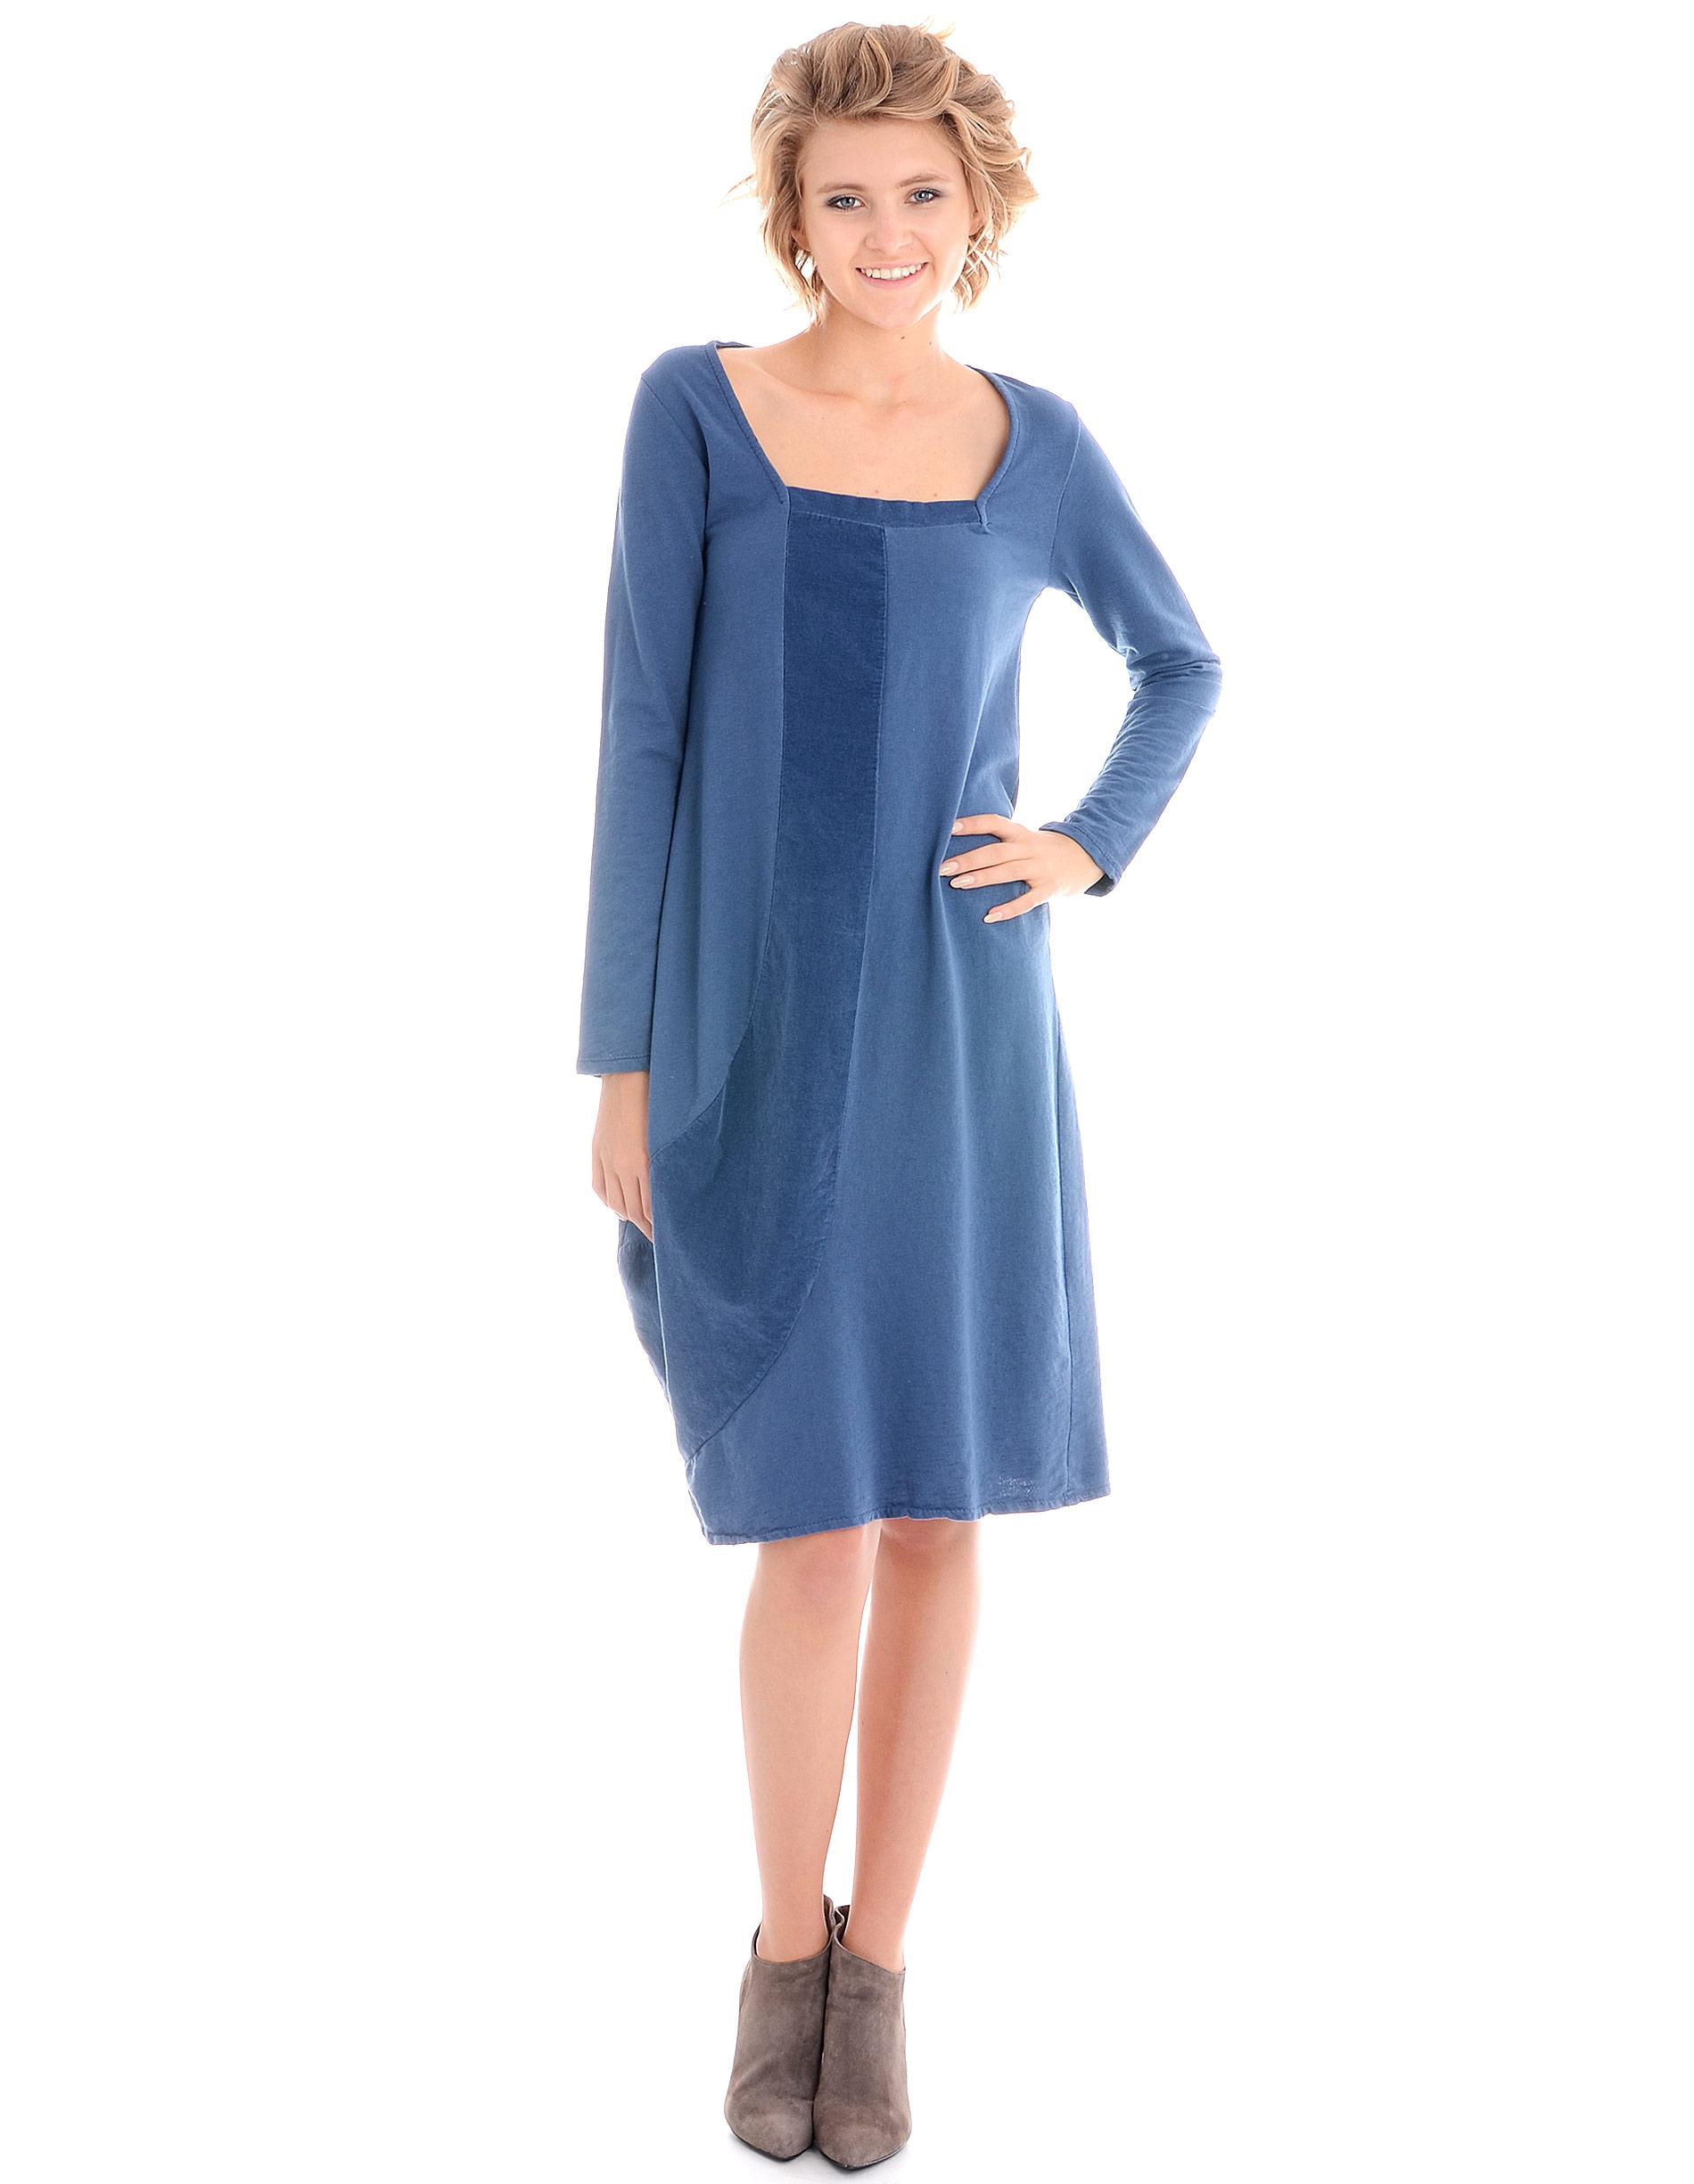 Sukienka - 34-2046 JEANS - Unisono